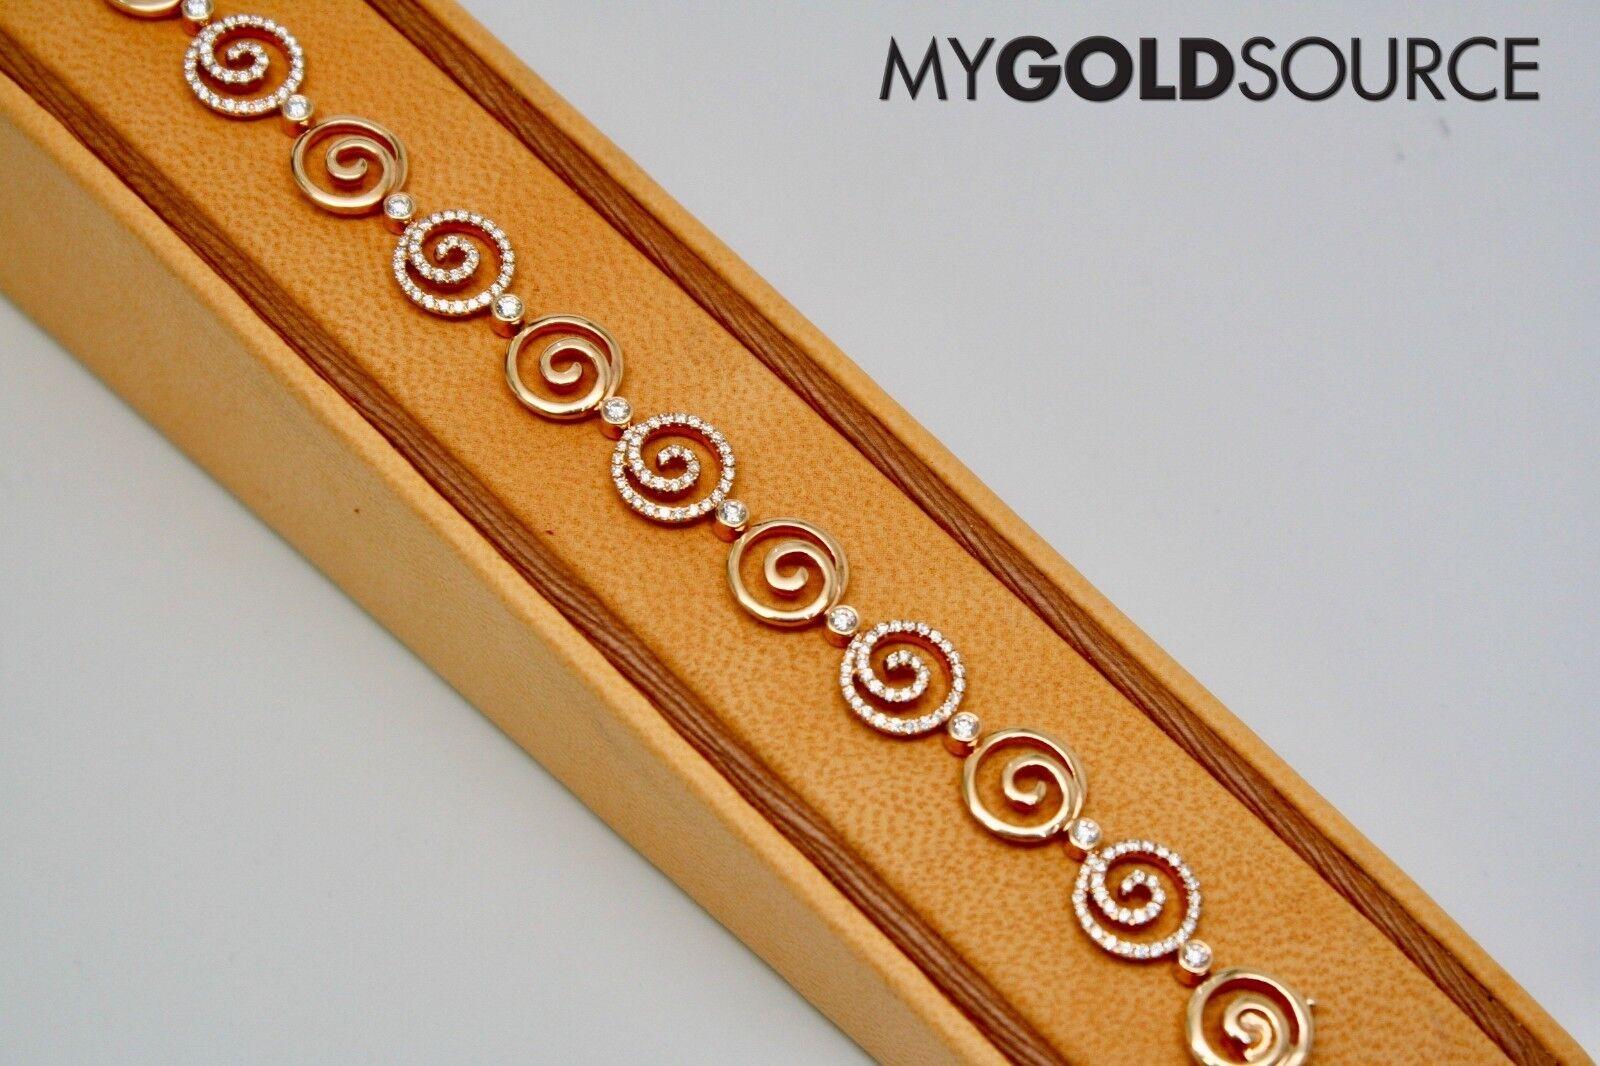 18k pink gold Spiral Circles Diamond Bracelet 6.5 Inches 1.69 Carat 222 Round